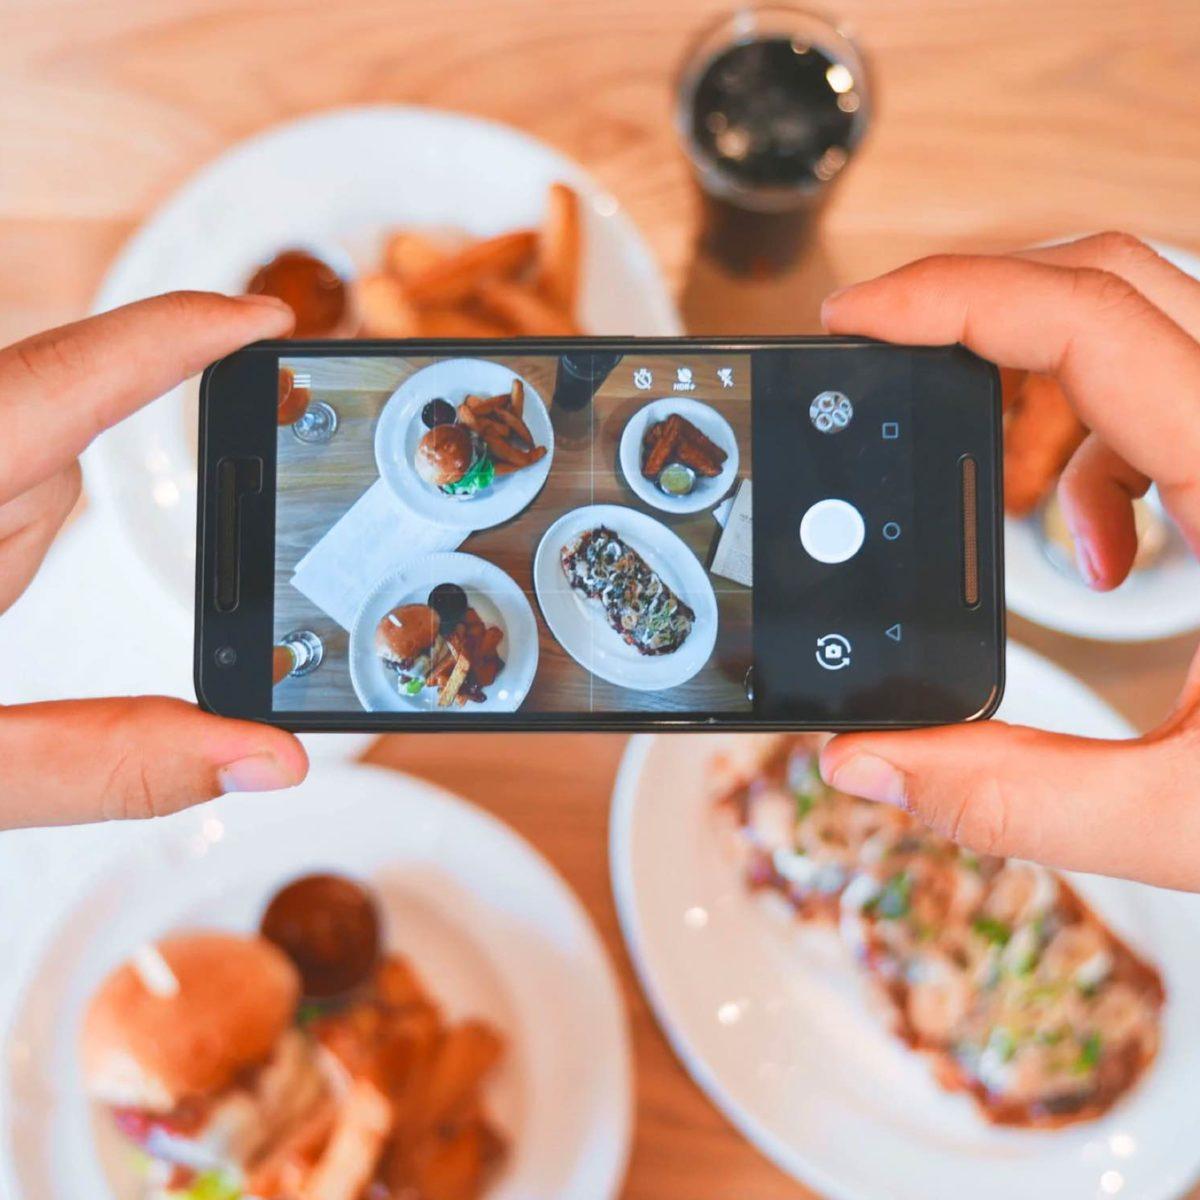 monitorare i social media